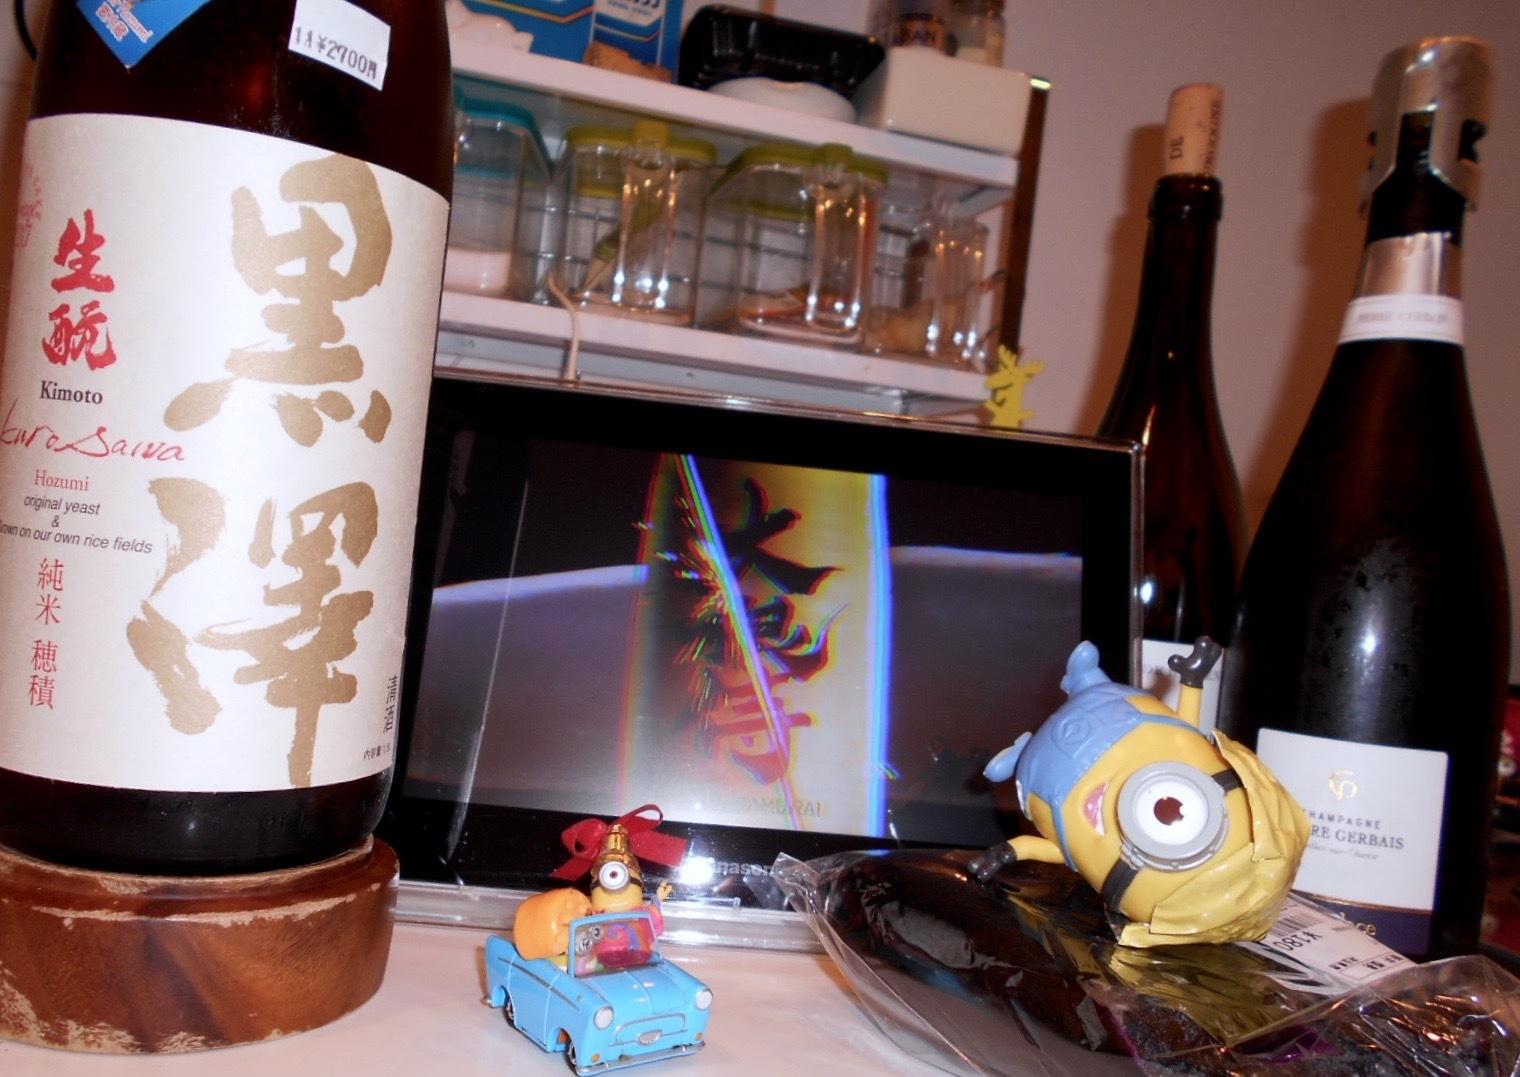 kurosawa_hozumi29by5_1.jpg